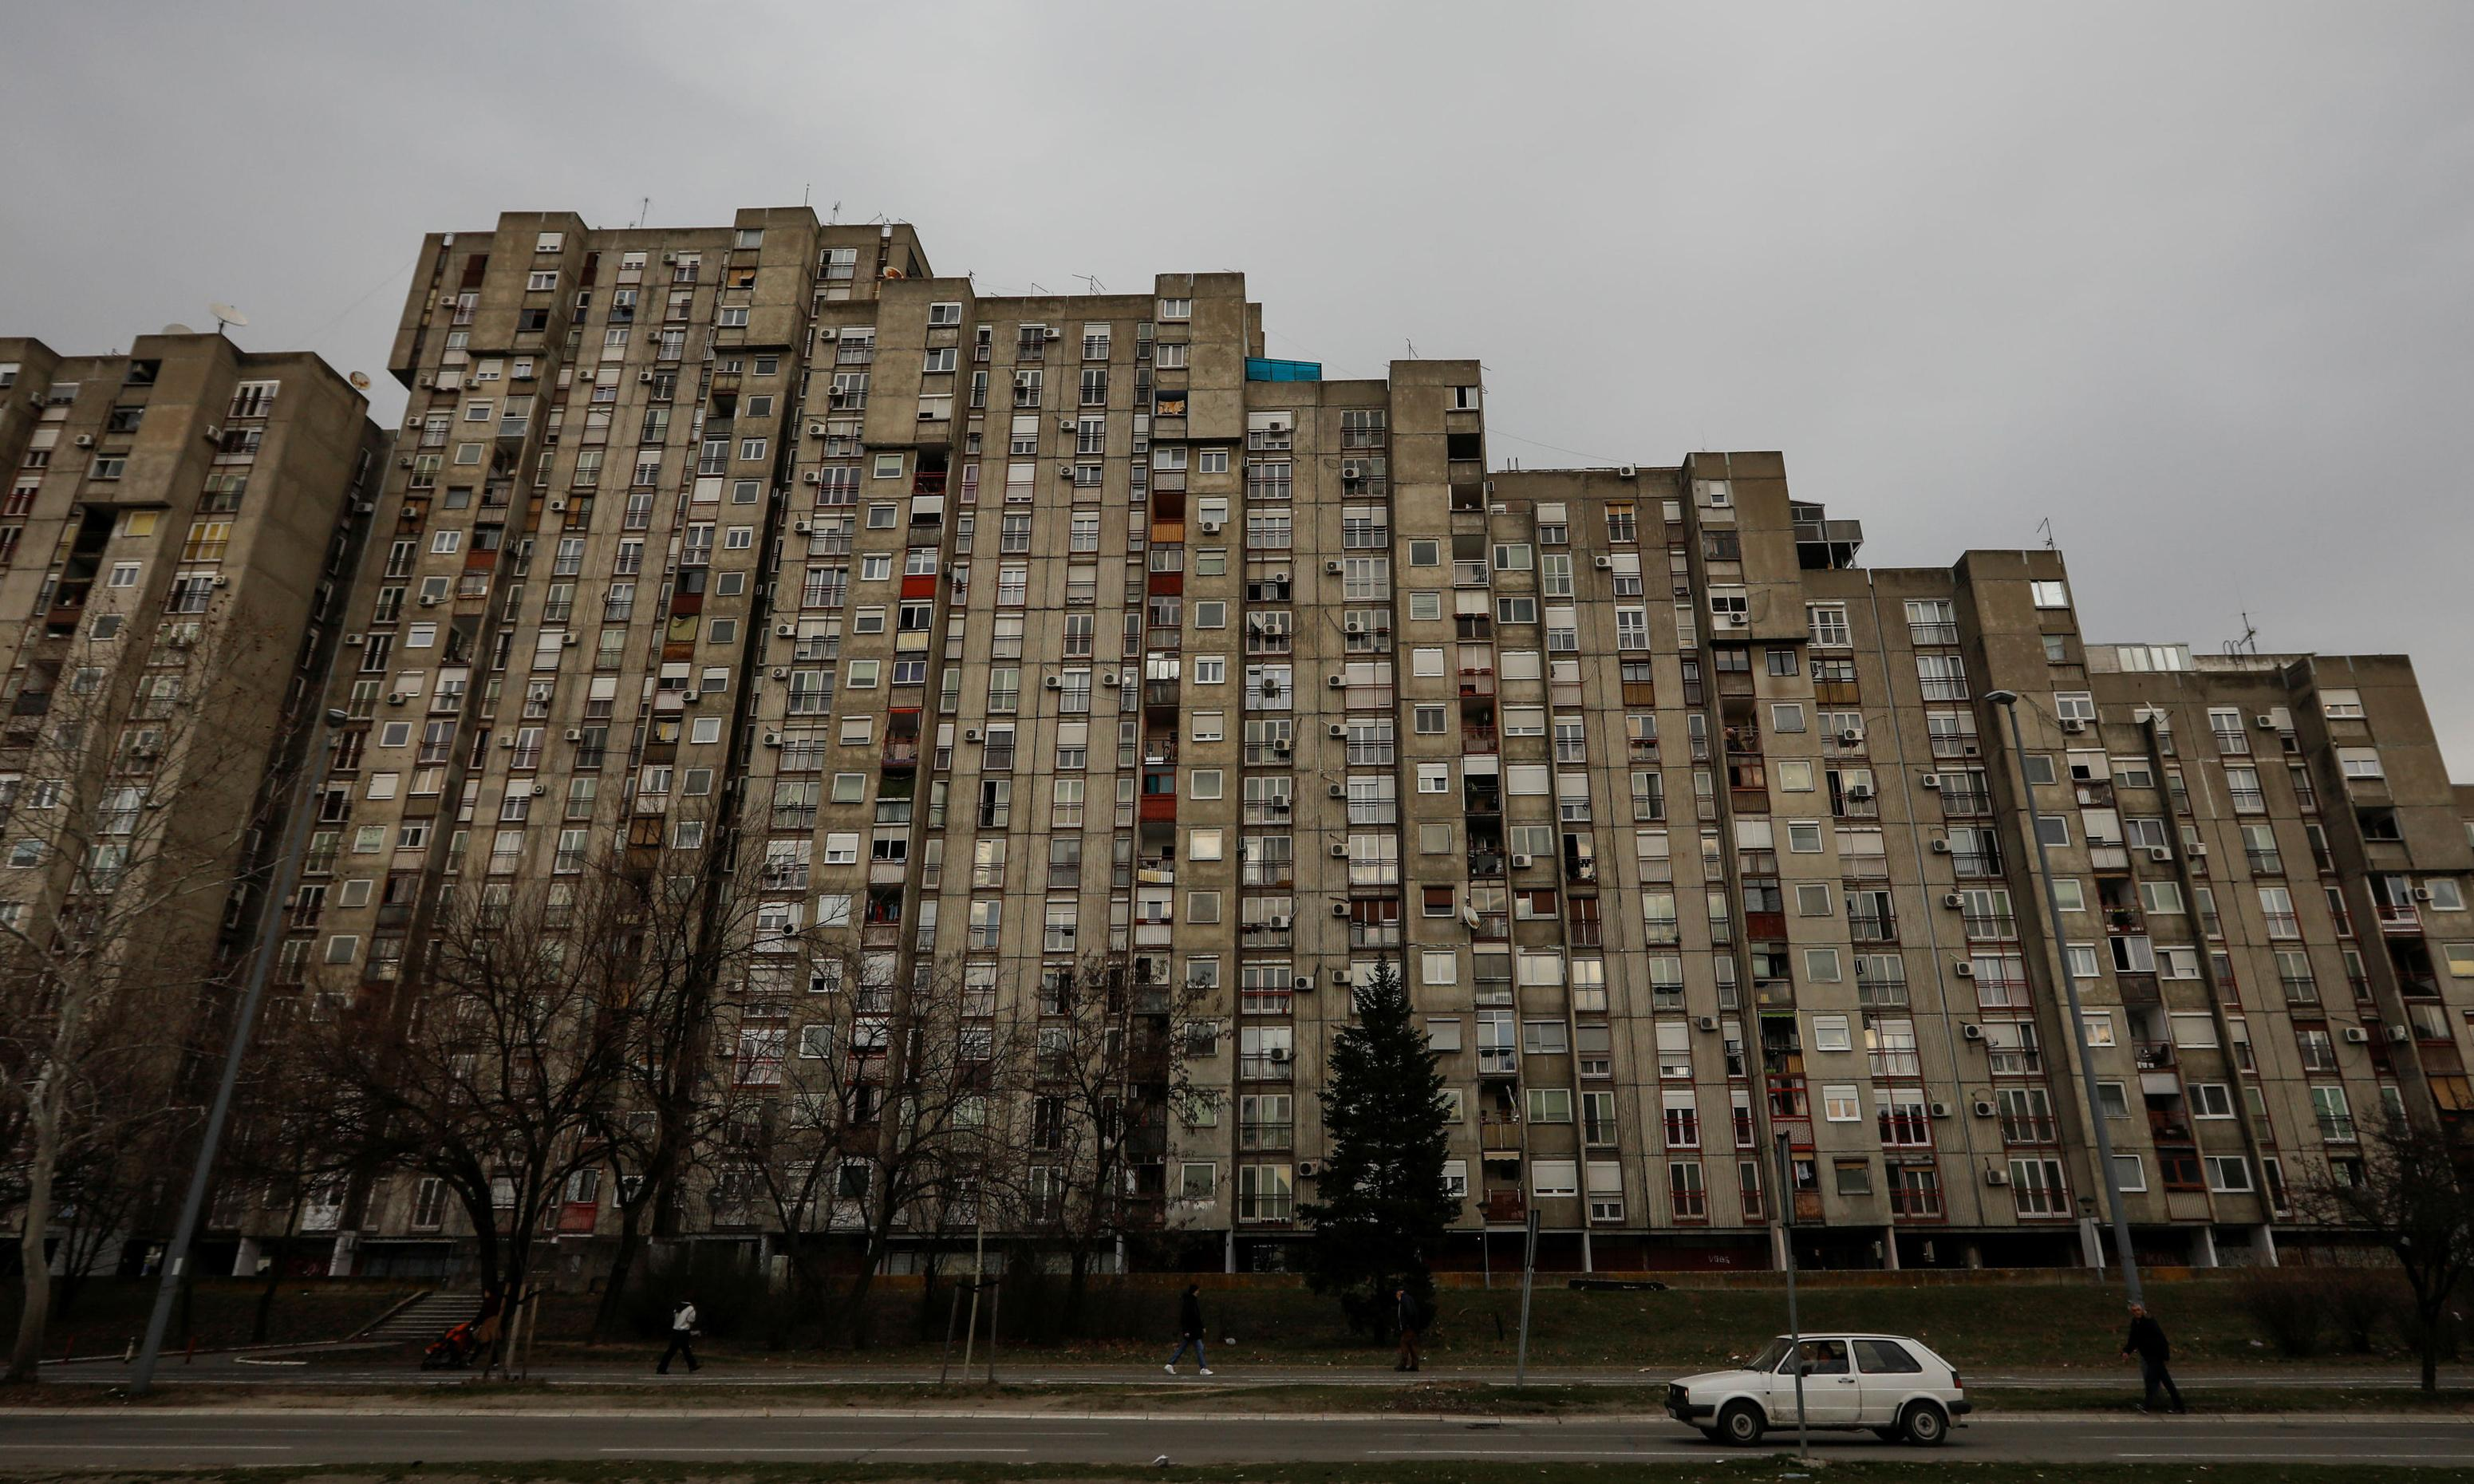 Former Yugoslavia's brutalist beauty – a photo essay